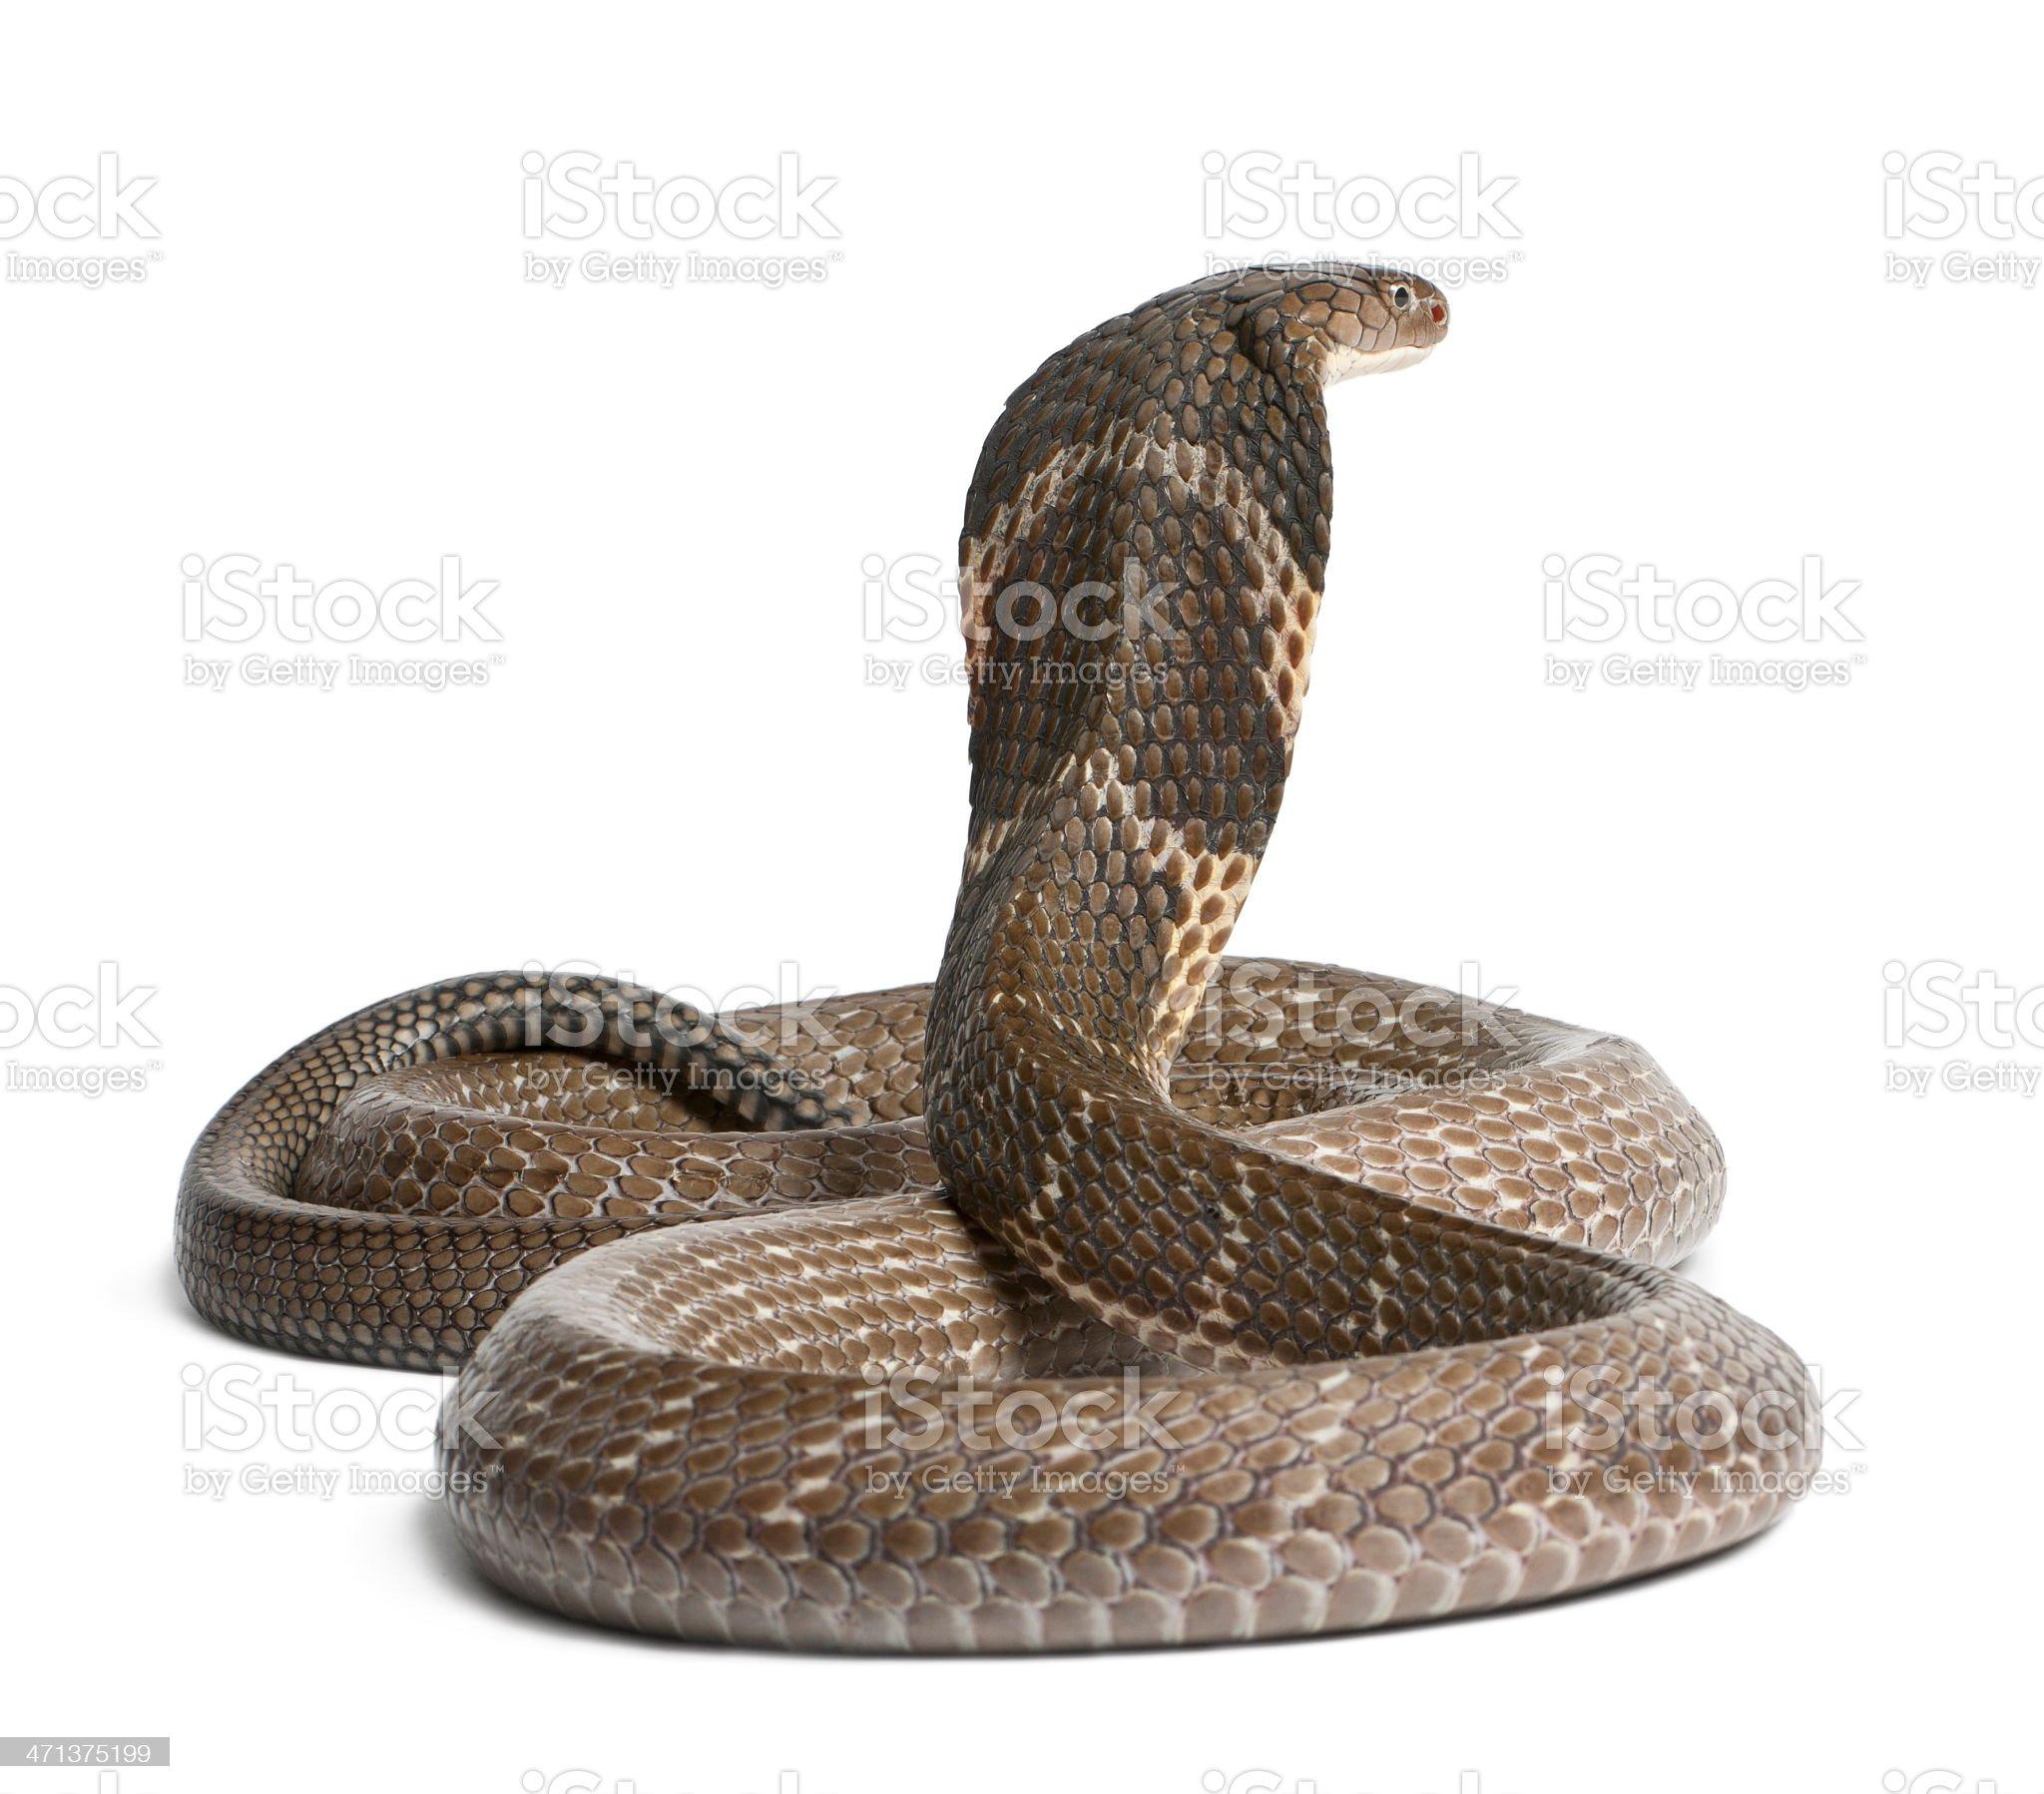 king cobra - Ophiophagus hannah, poisonous, white background royalty-free stock photo